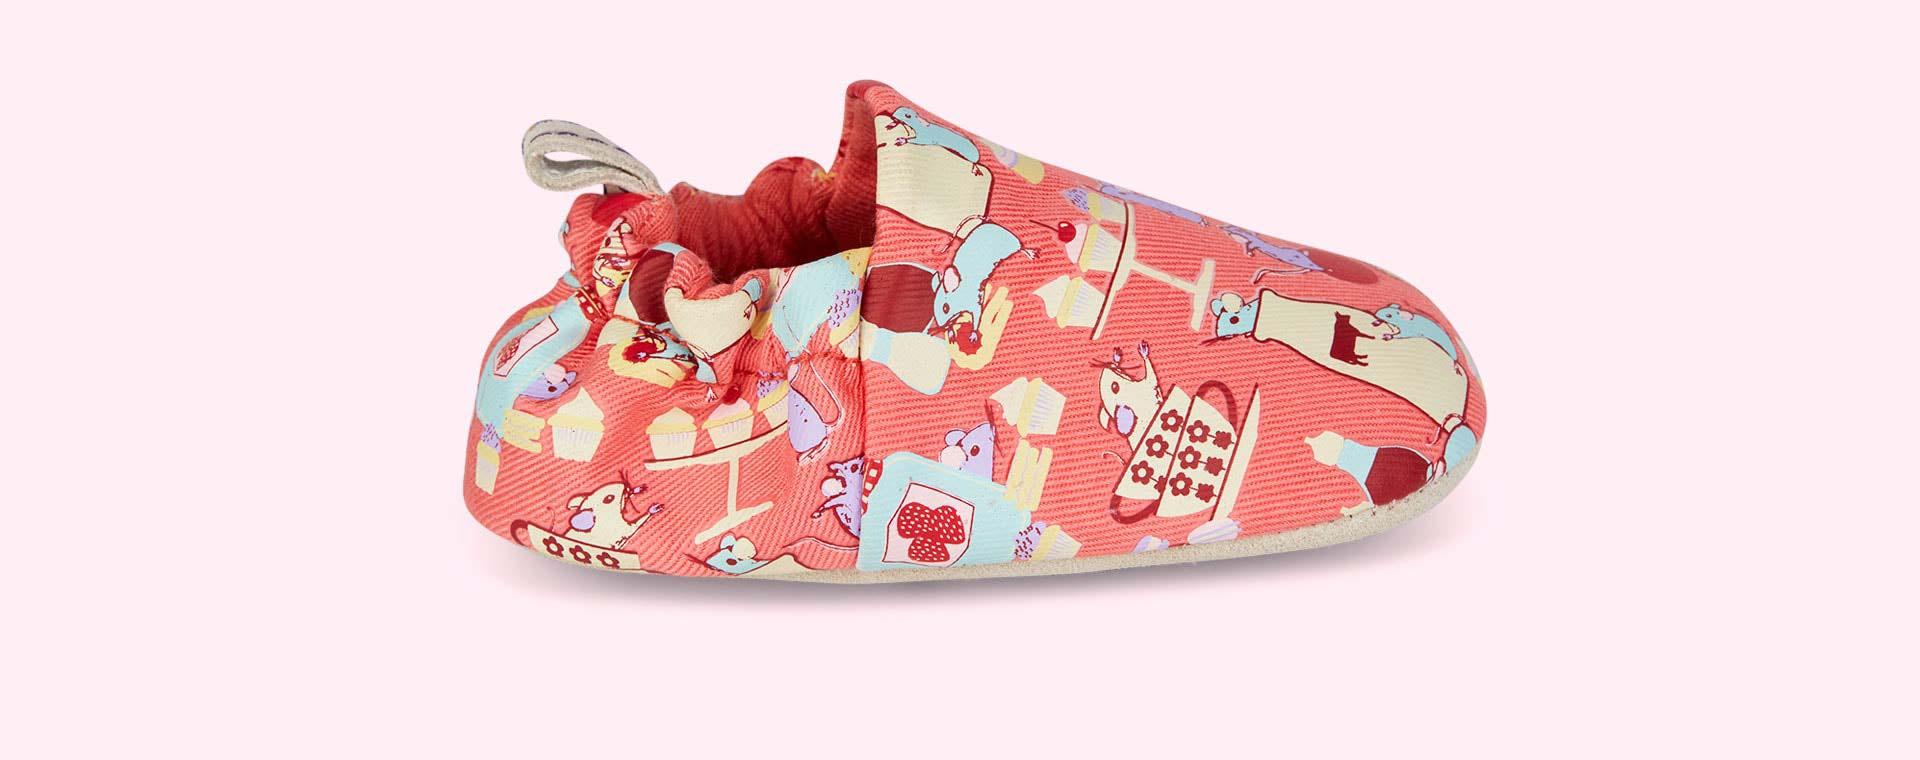 Mice Poco Nido Printed Mini Shoes